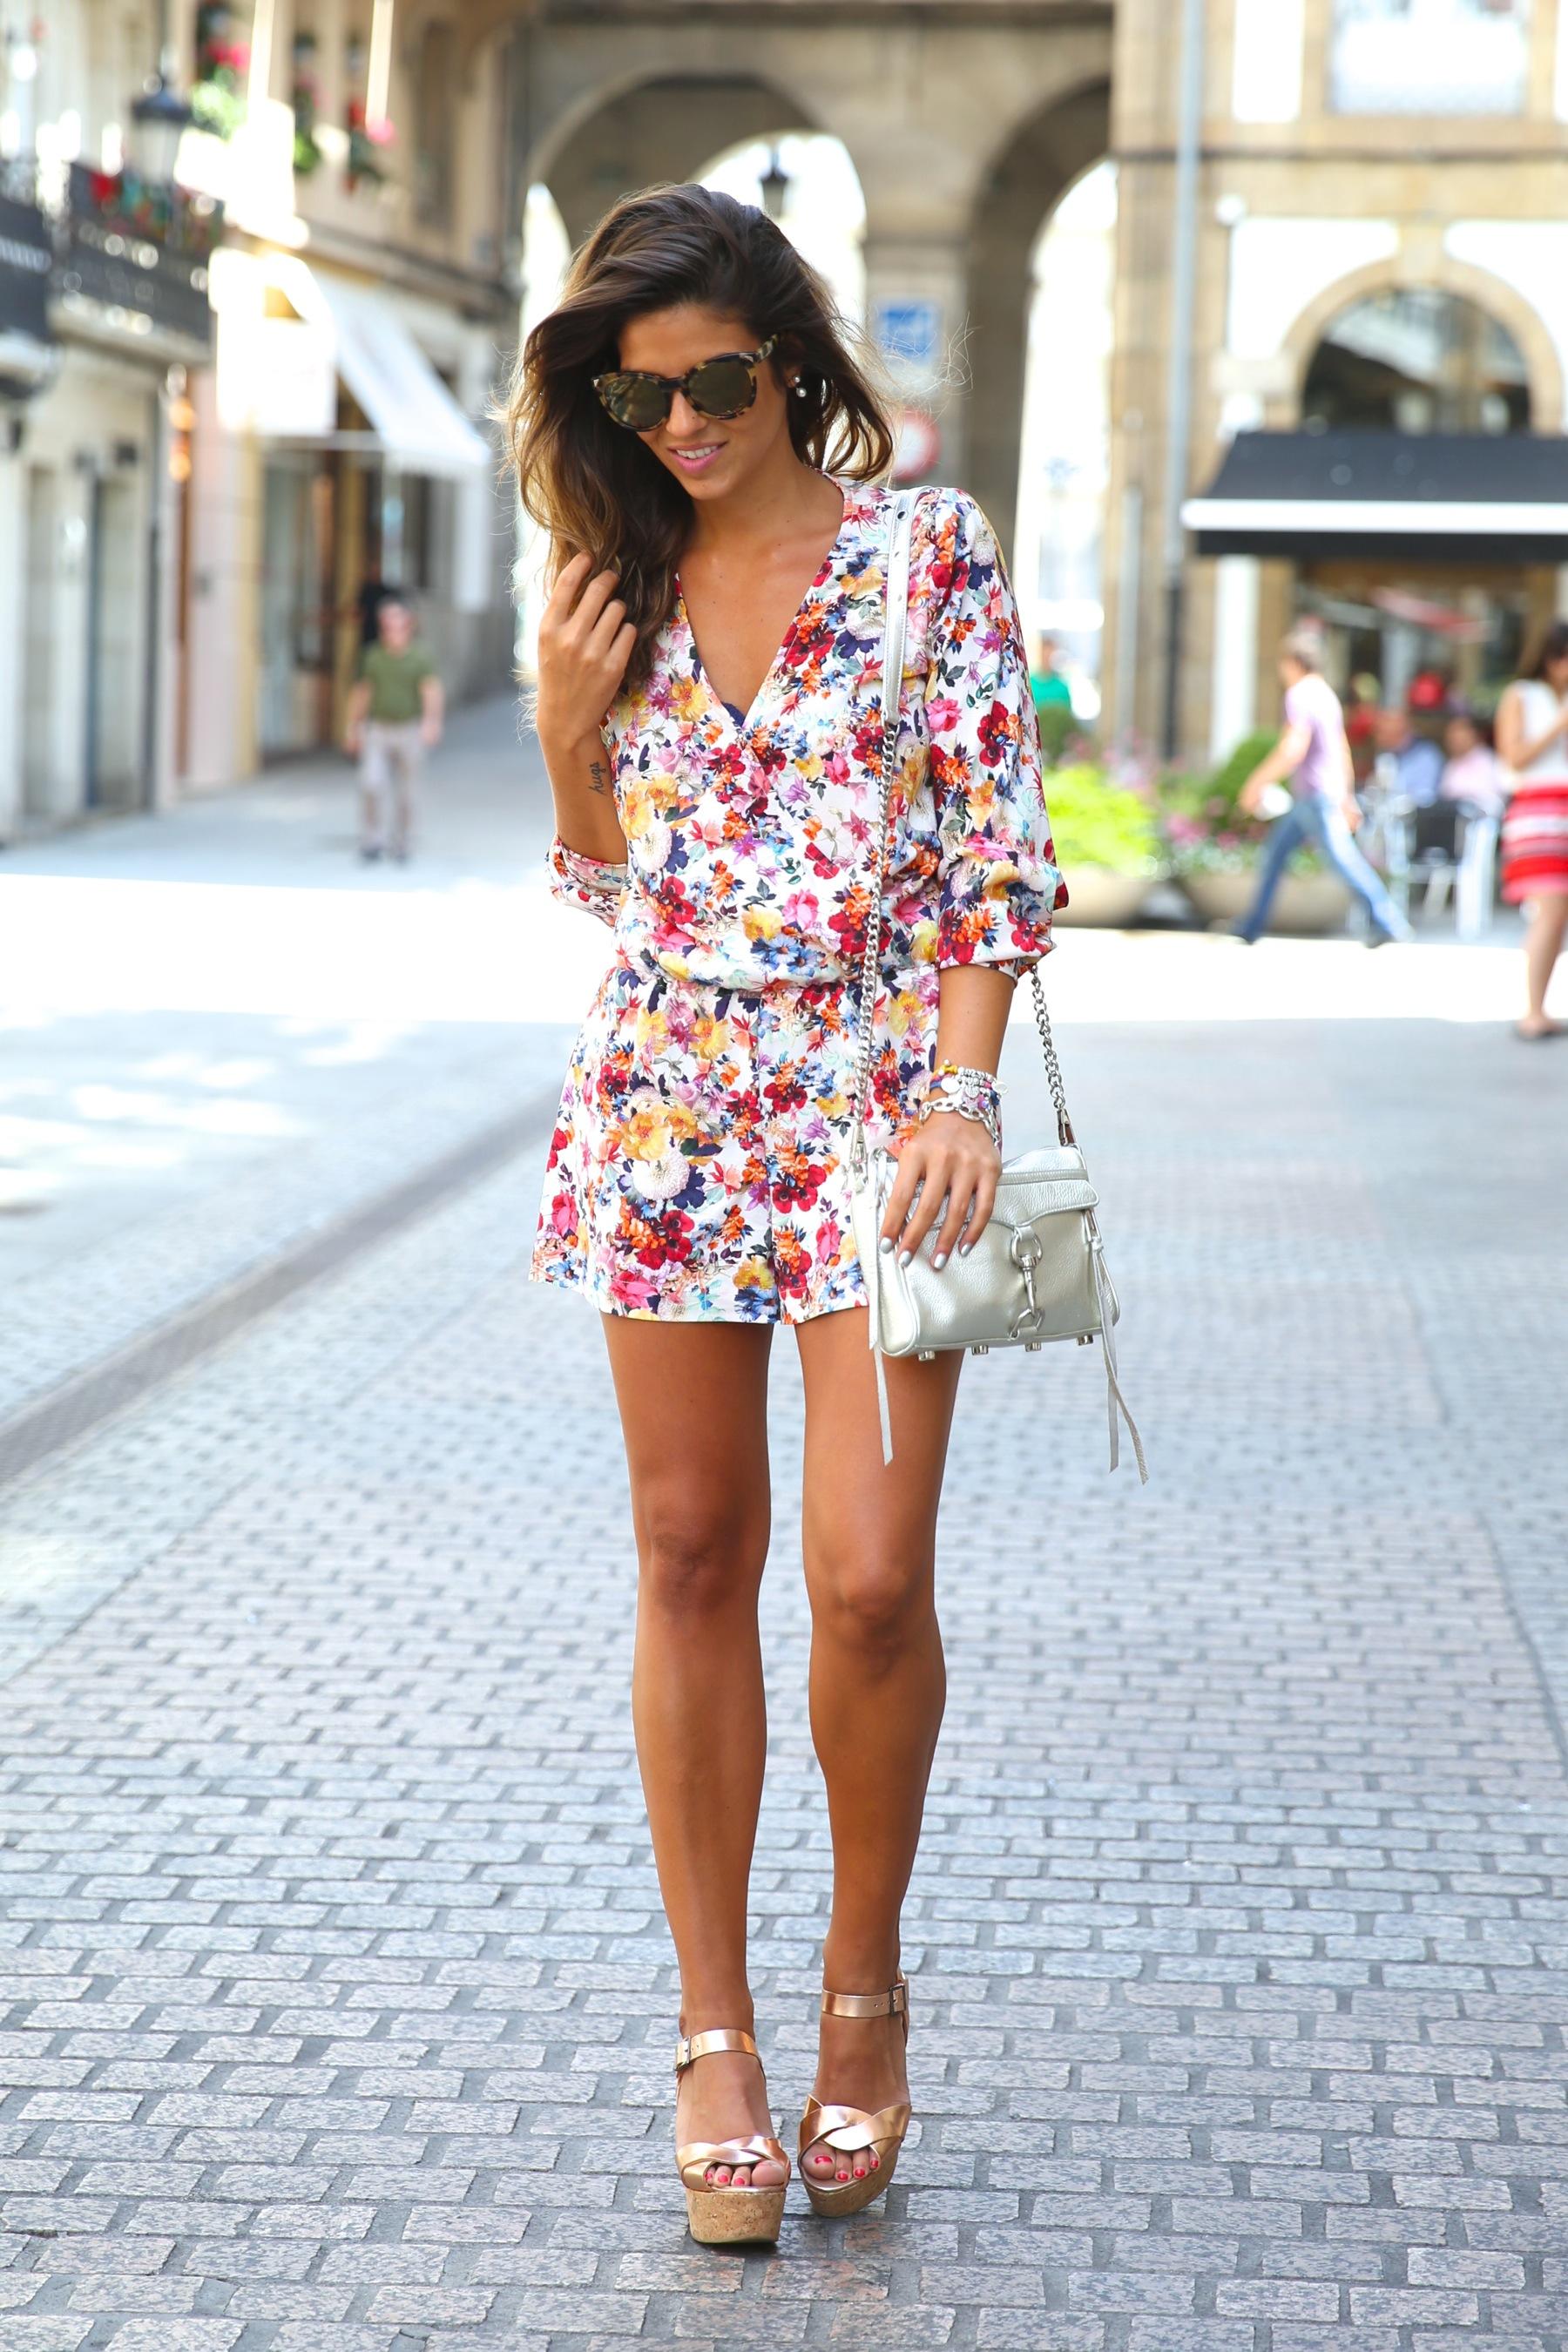 trendy_taste-look-outfit-street_style-ootd-blog-blogger-fashion_spain-moda_españa-mono-flores-flower_print-verano-summer-overall-la_coruña-7